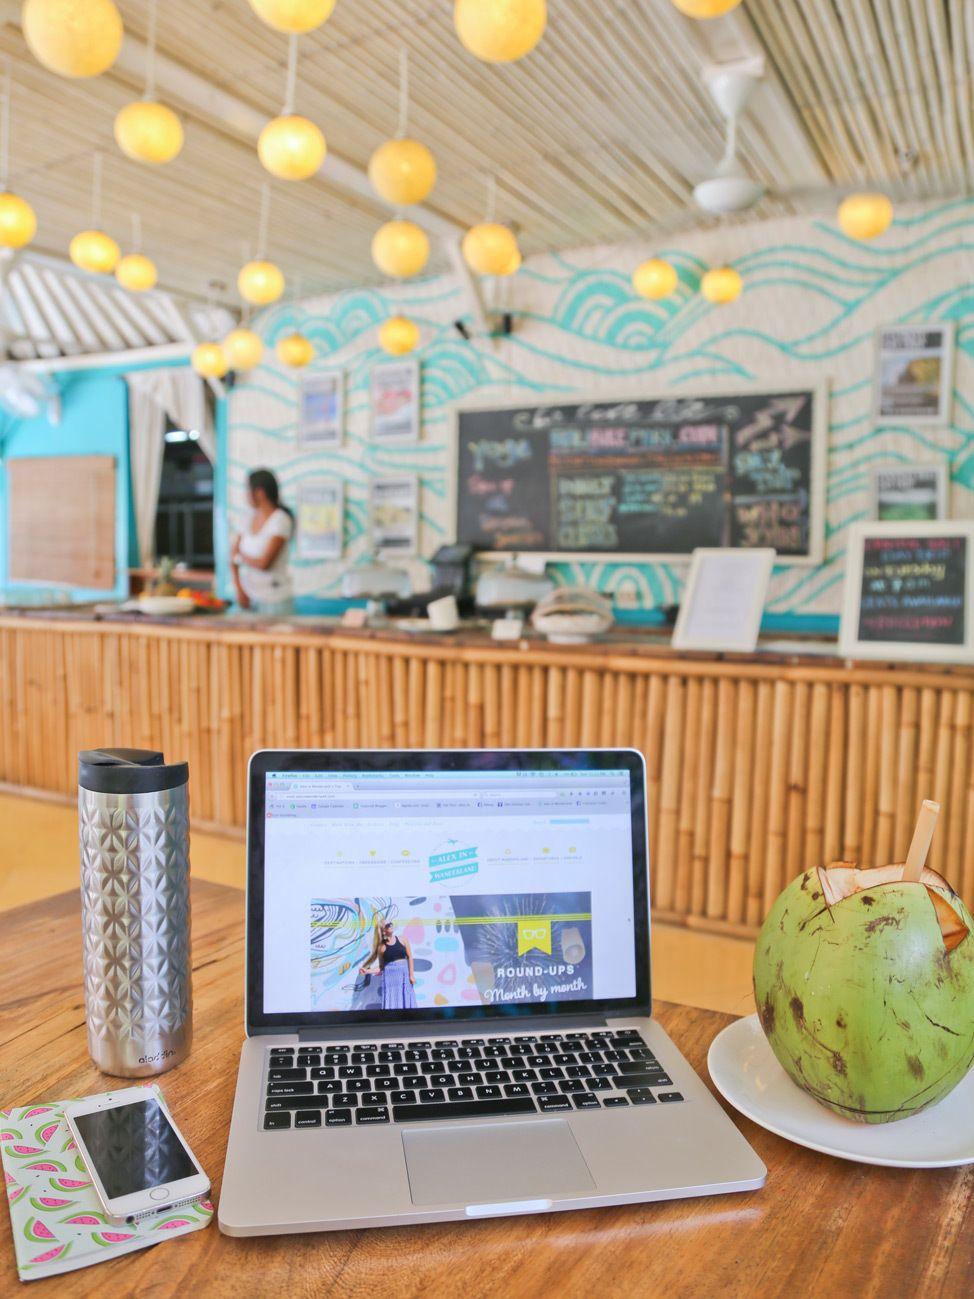 Bali Chillhouse Travel Blog Review